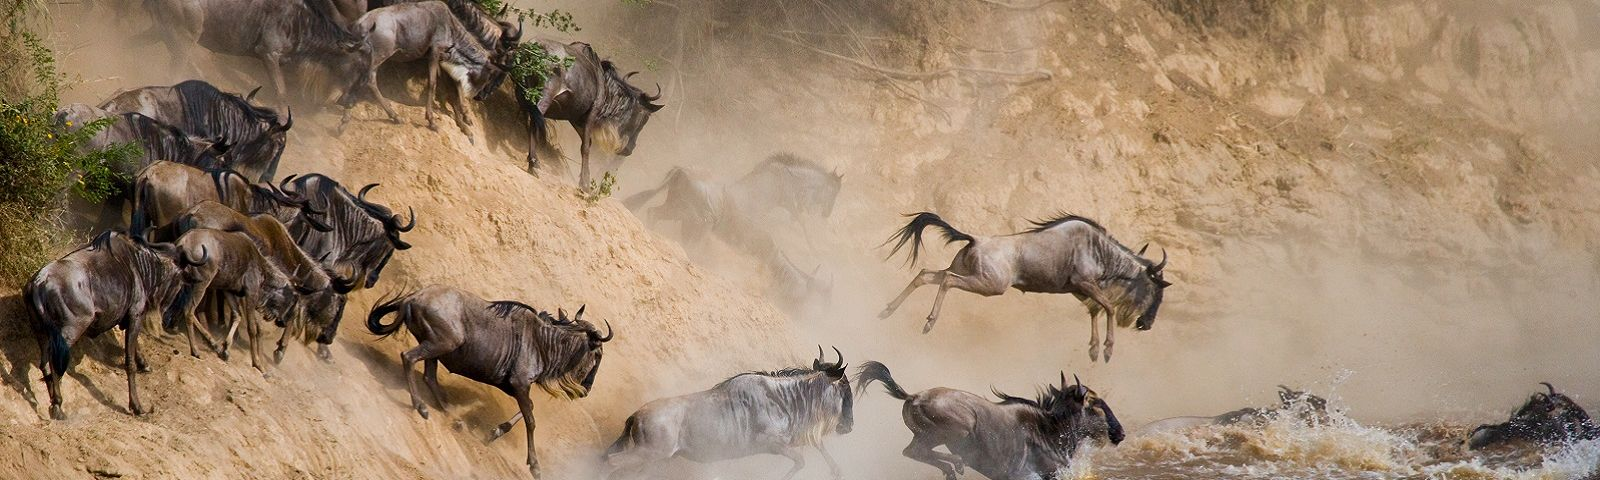 Best Time to Visit Kenya - Wildebeests are crossing Mara river. Great Migration. Kenya. Tanzania. Masai Mara National Park